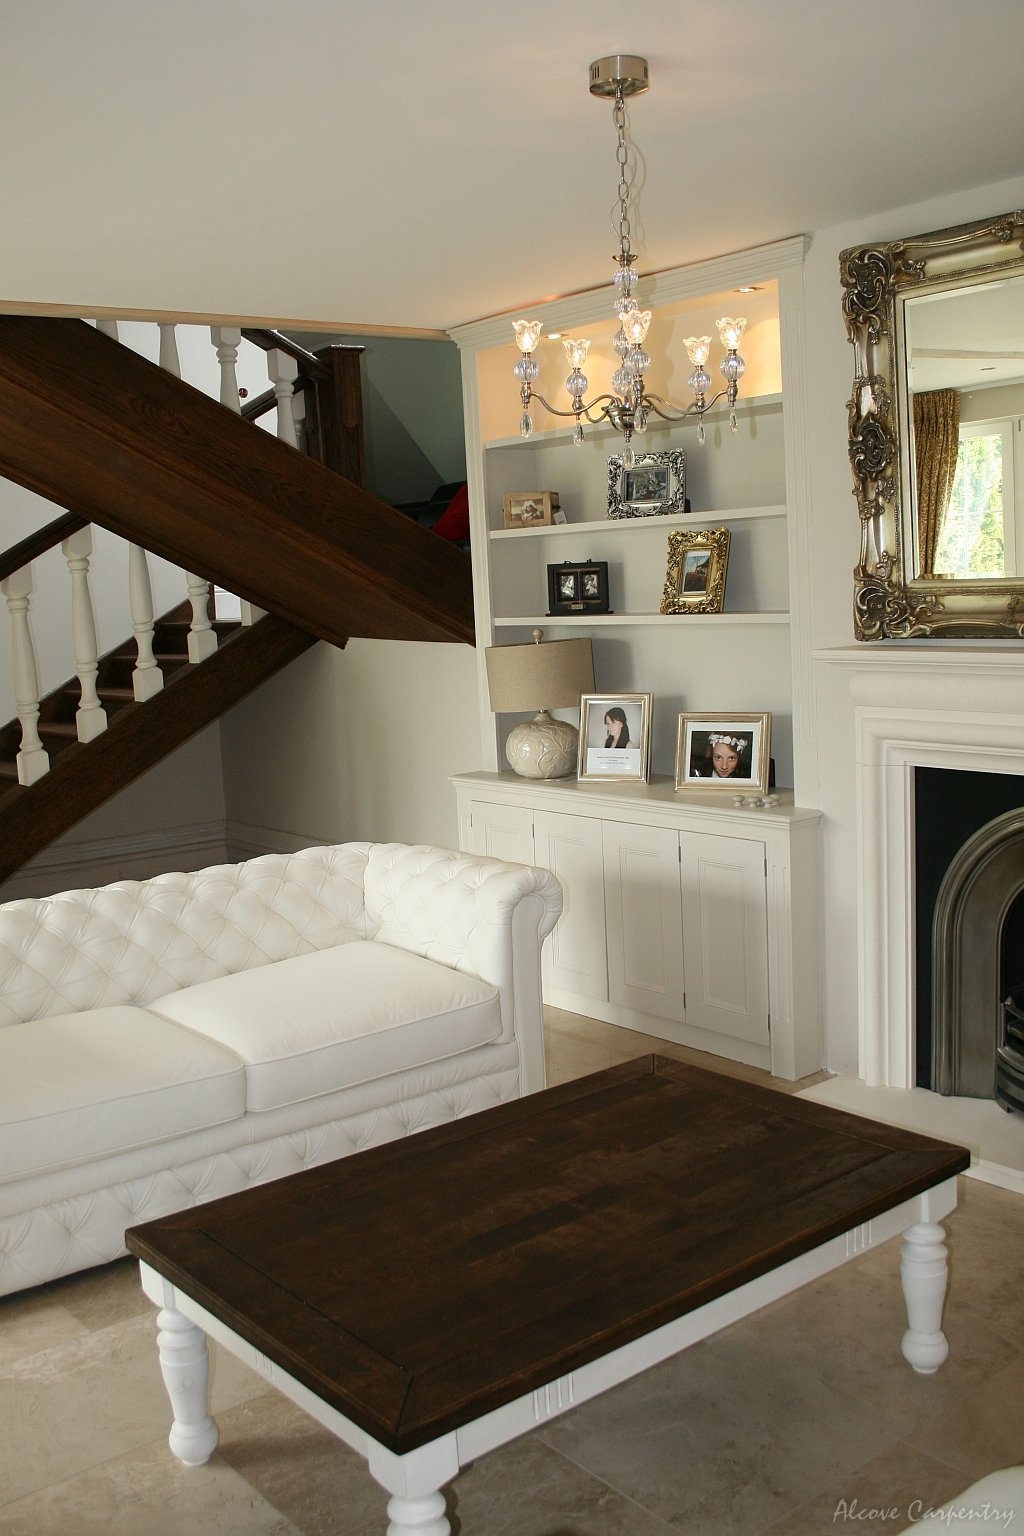 Alcove Carpentry Interior And Custom Made Furniture